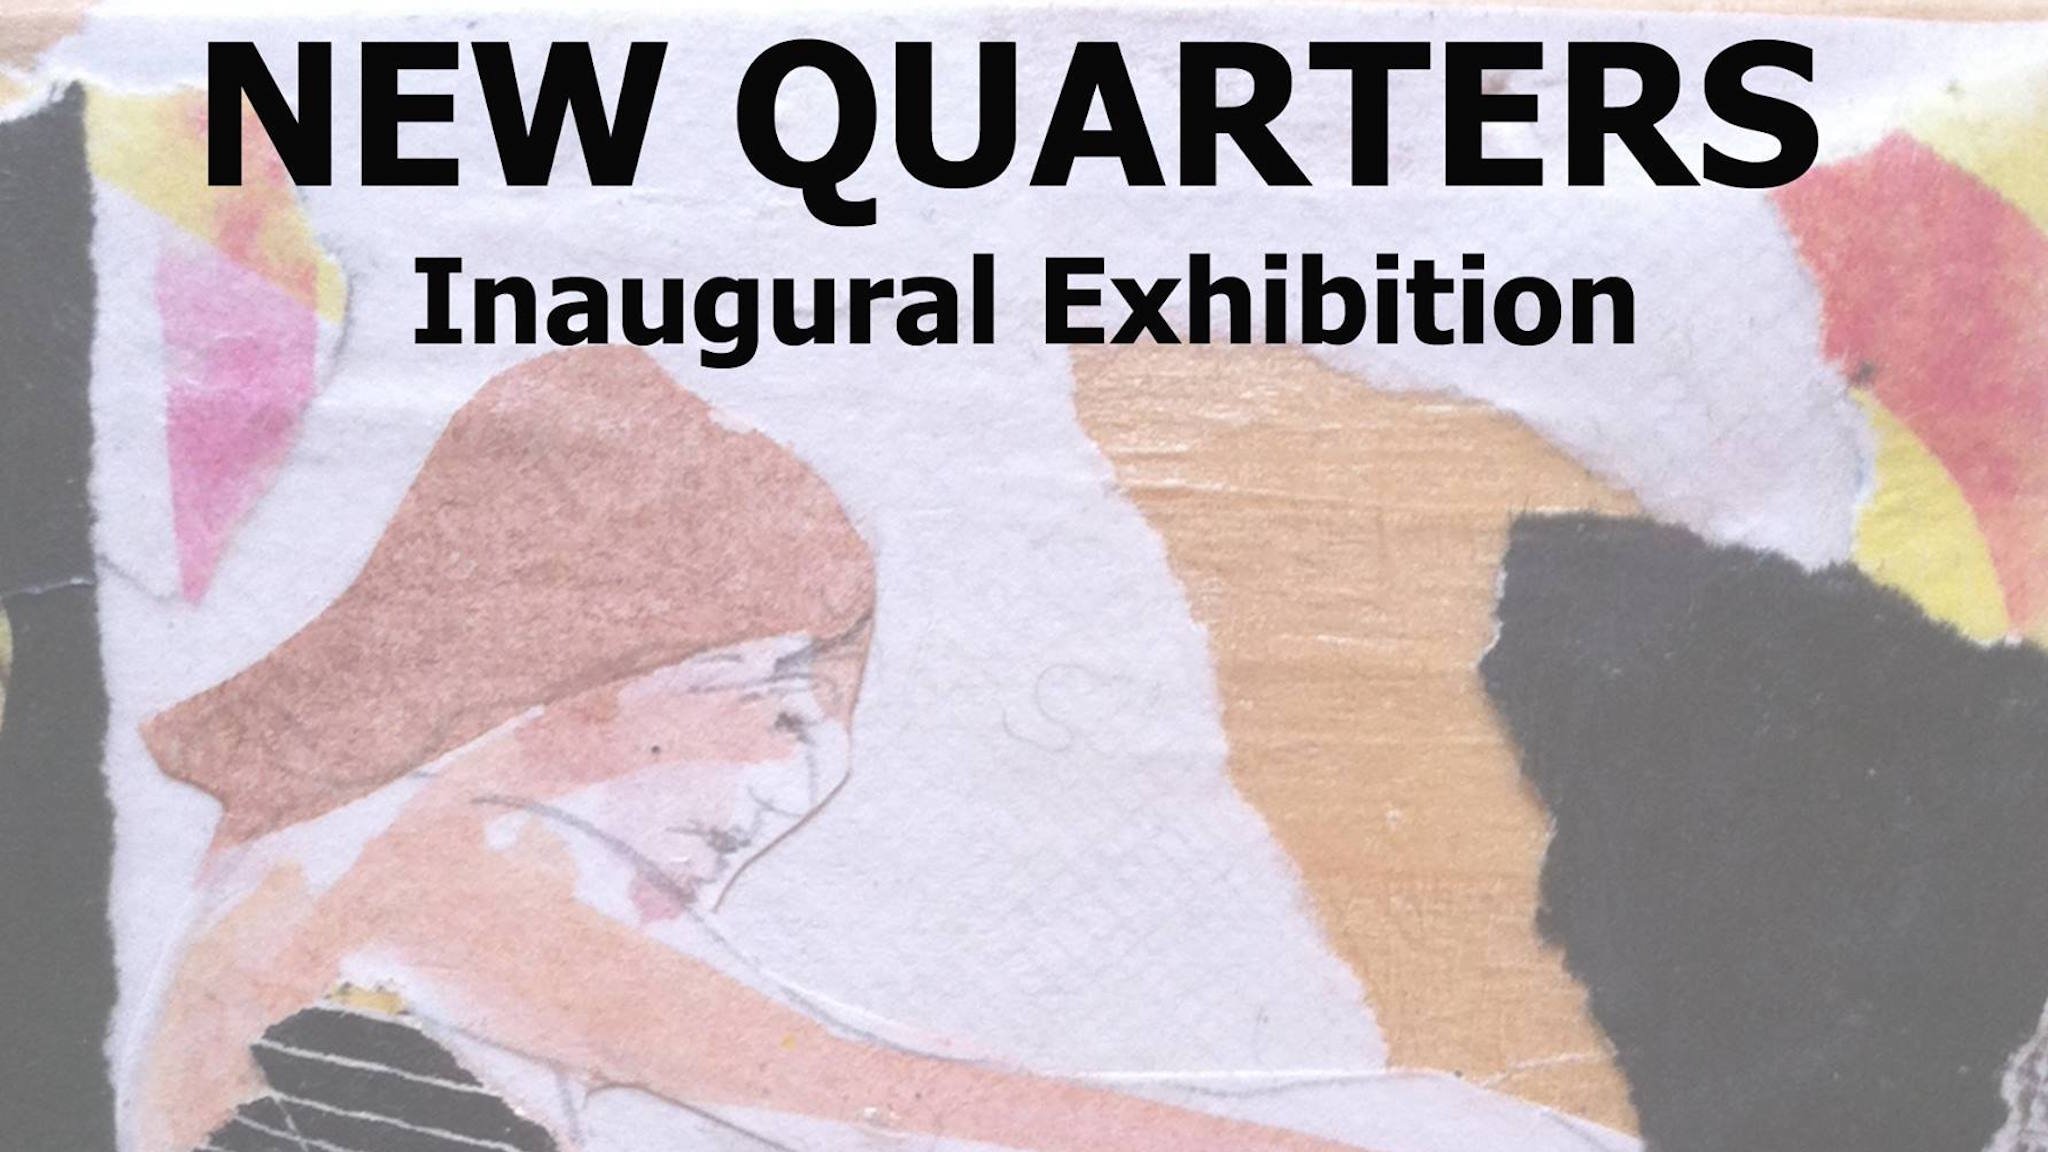 HVAW-NewQuarters-Banner.jpg